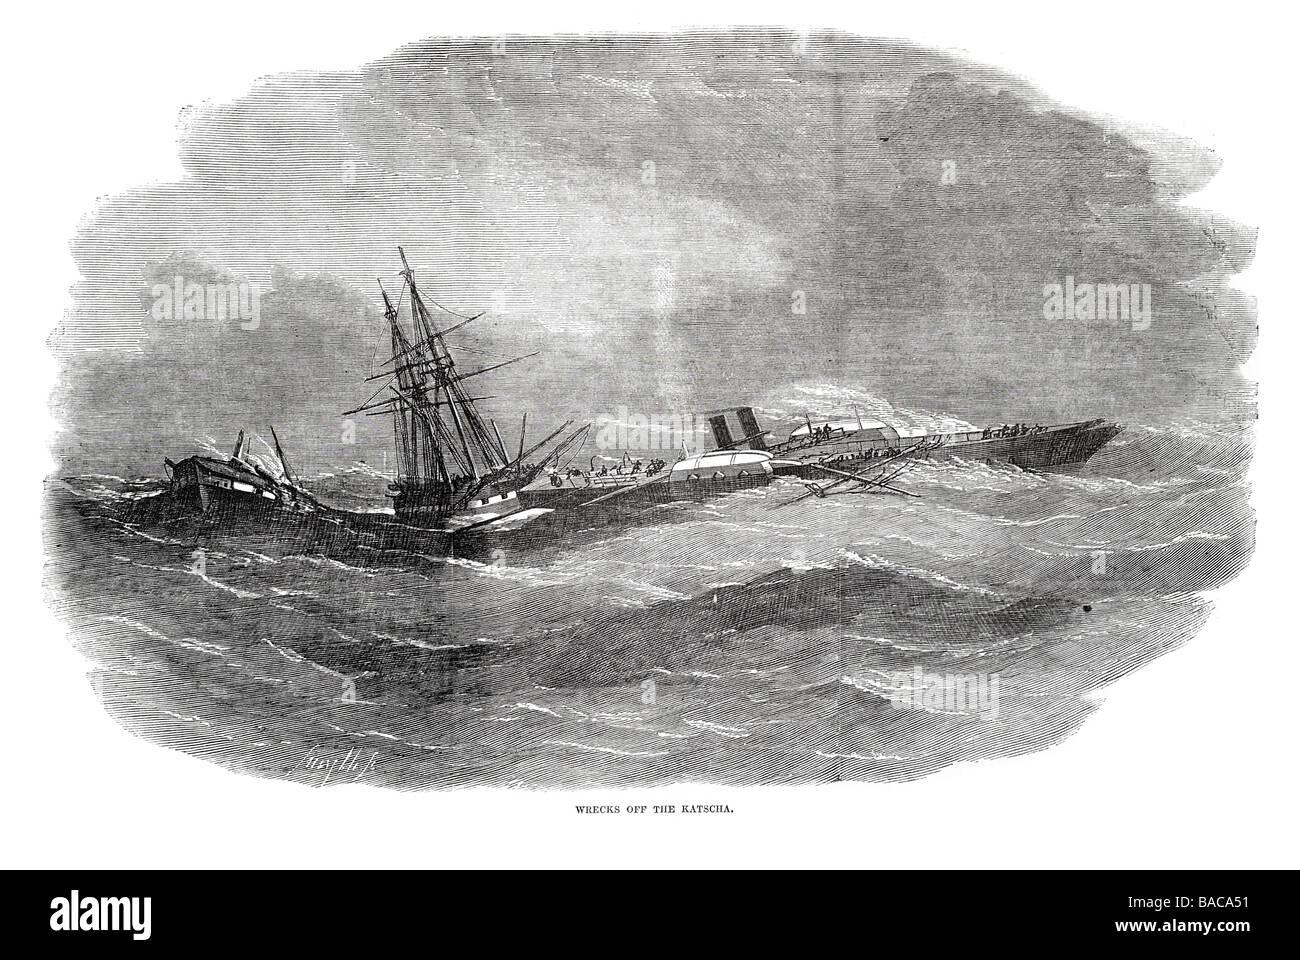 wrecks off the katscha 1854 - Stock Image